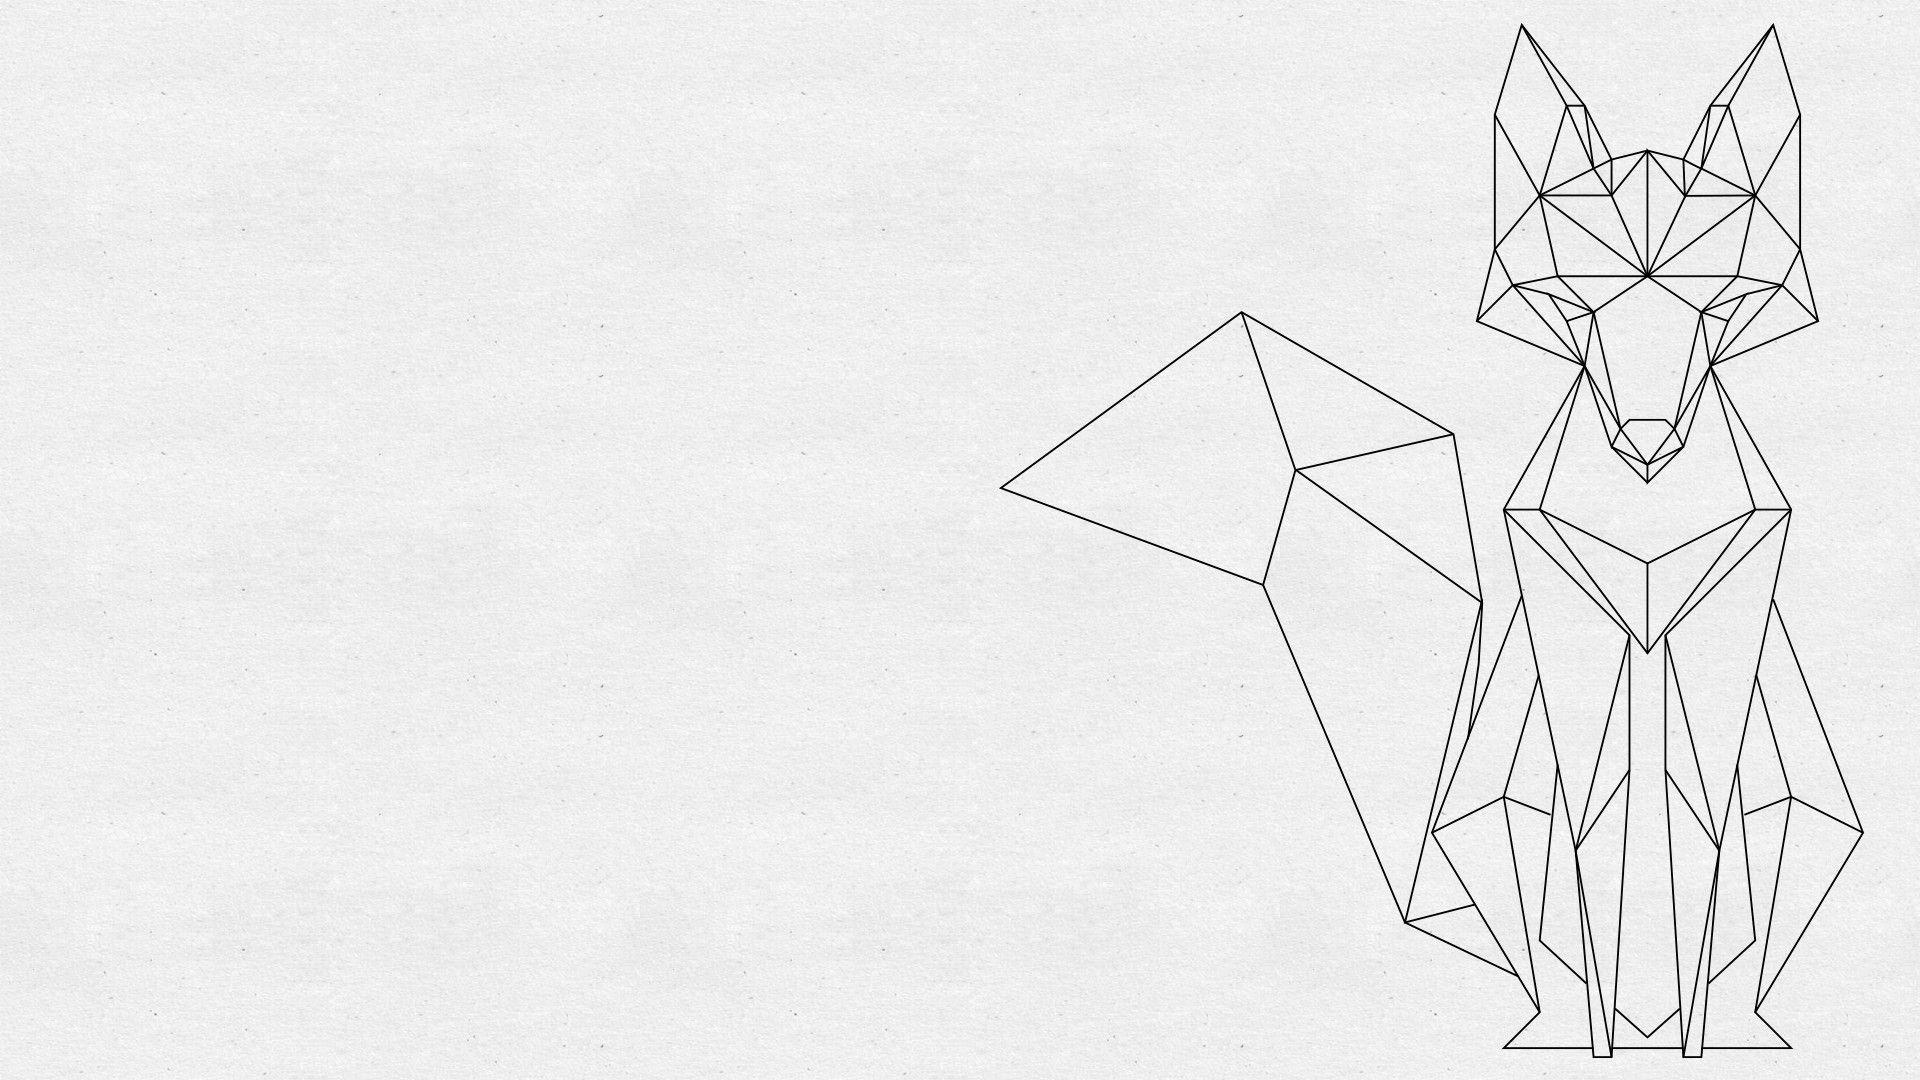 Daily hd wallpaper Geometric Fox [1920x1080] More sizes